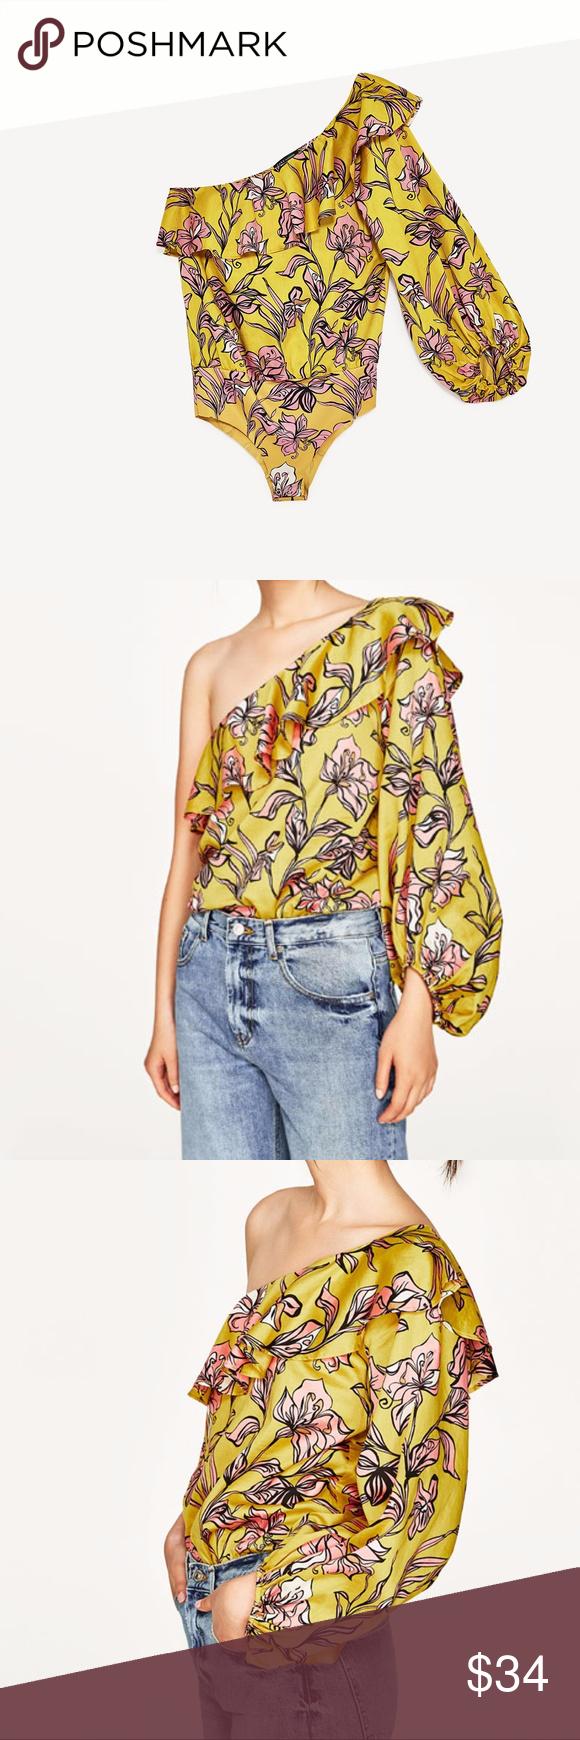 720206c5 Zara Yellow Floral Bodysuit ZARA WOMEN NEW COLLECTION!! SS17 ASYMMETRIC  SLEEVE BODYSUIT 5580/